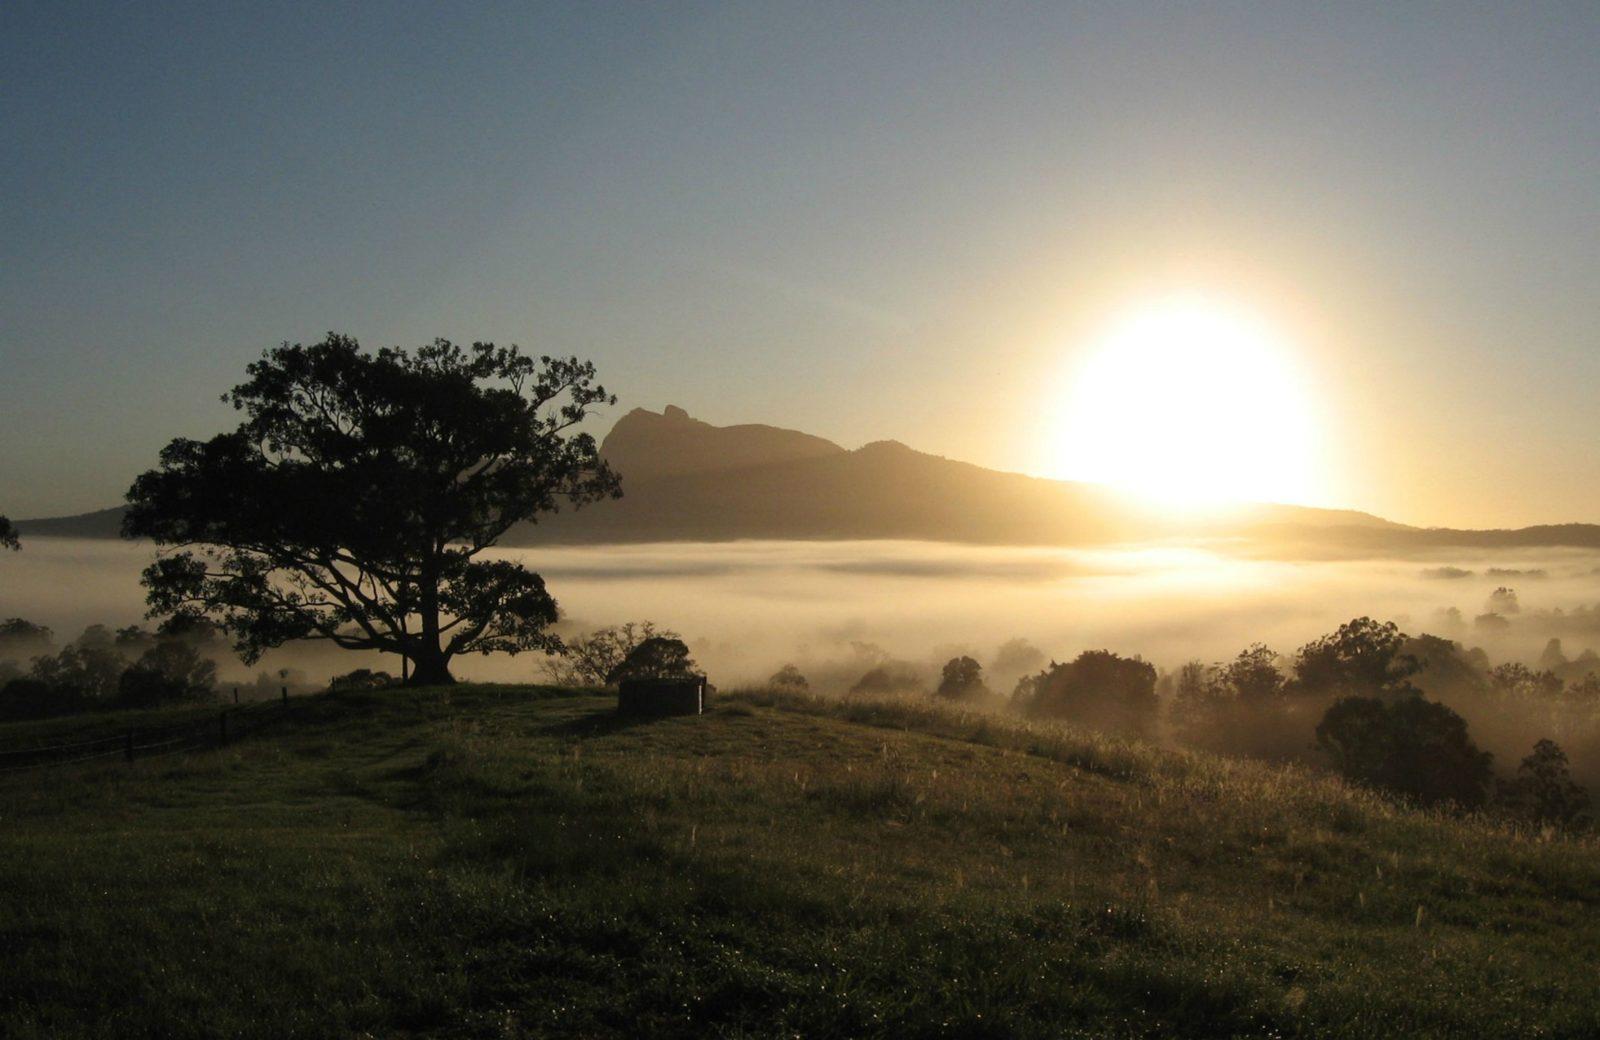 Sunrise, Wollumbin National Park. Photo: S Foreman.